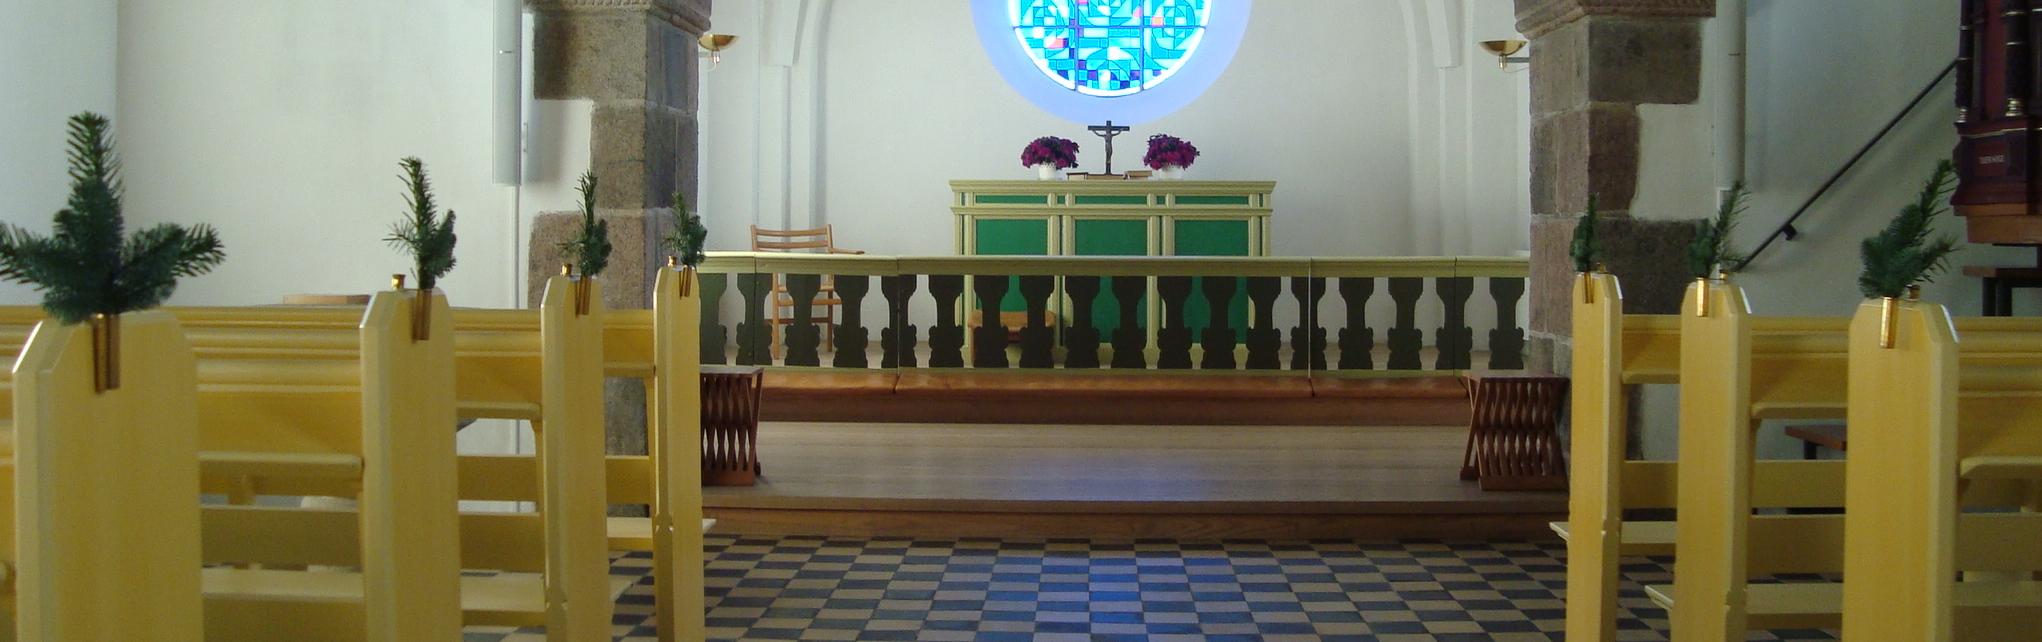 Kolind kirkes alter